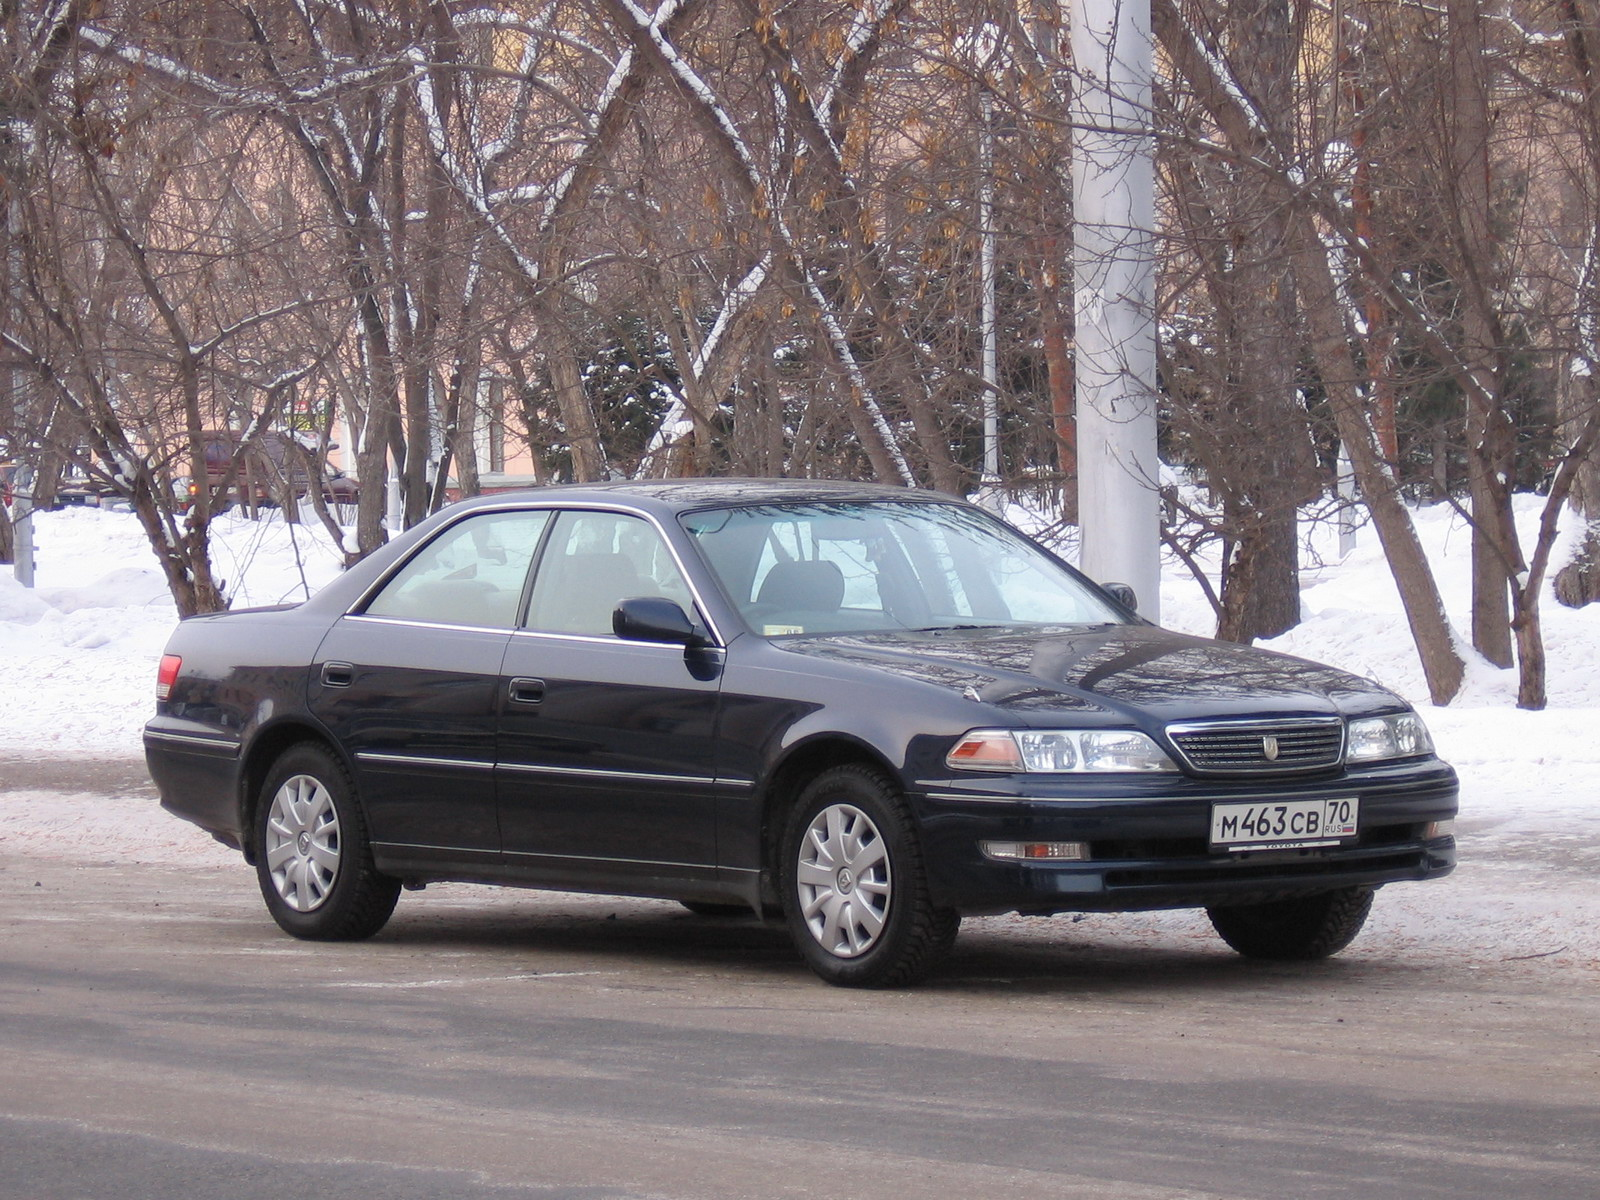 Kelebihan Kekurangan Toyota Mark Murah Berkualitas